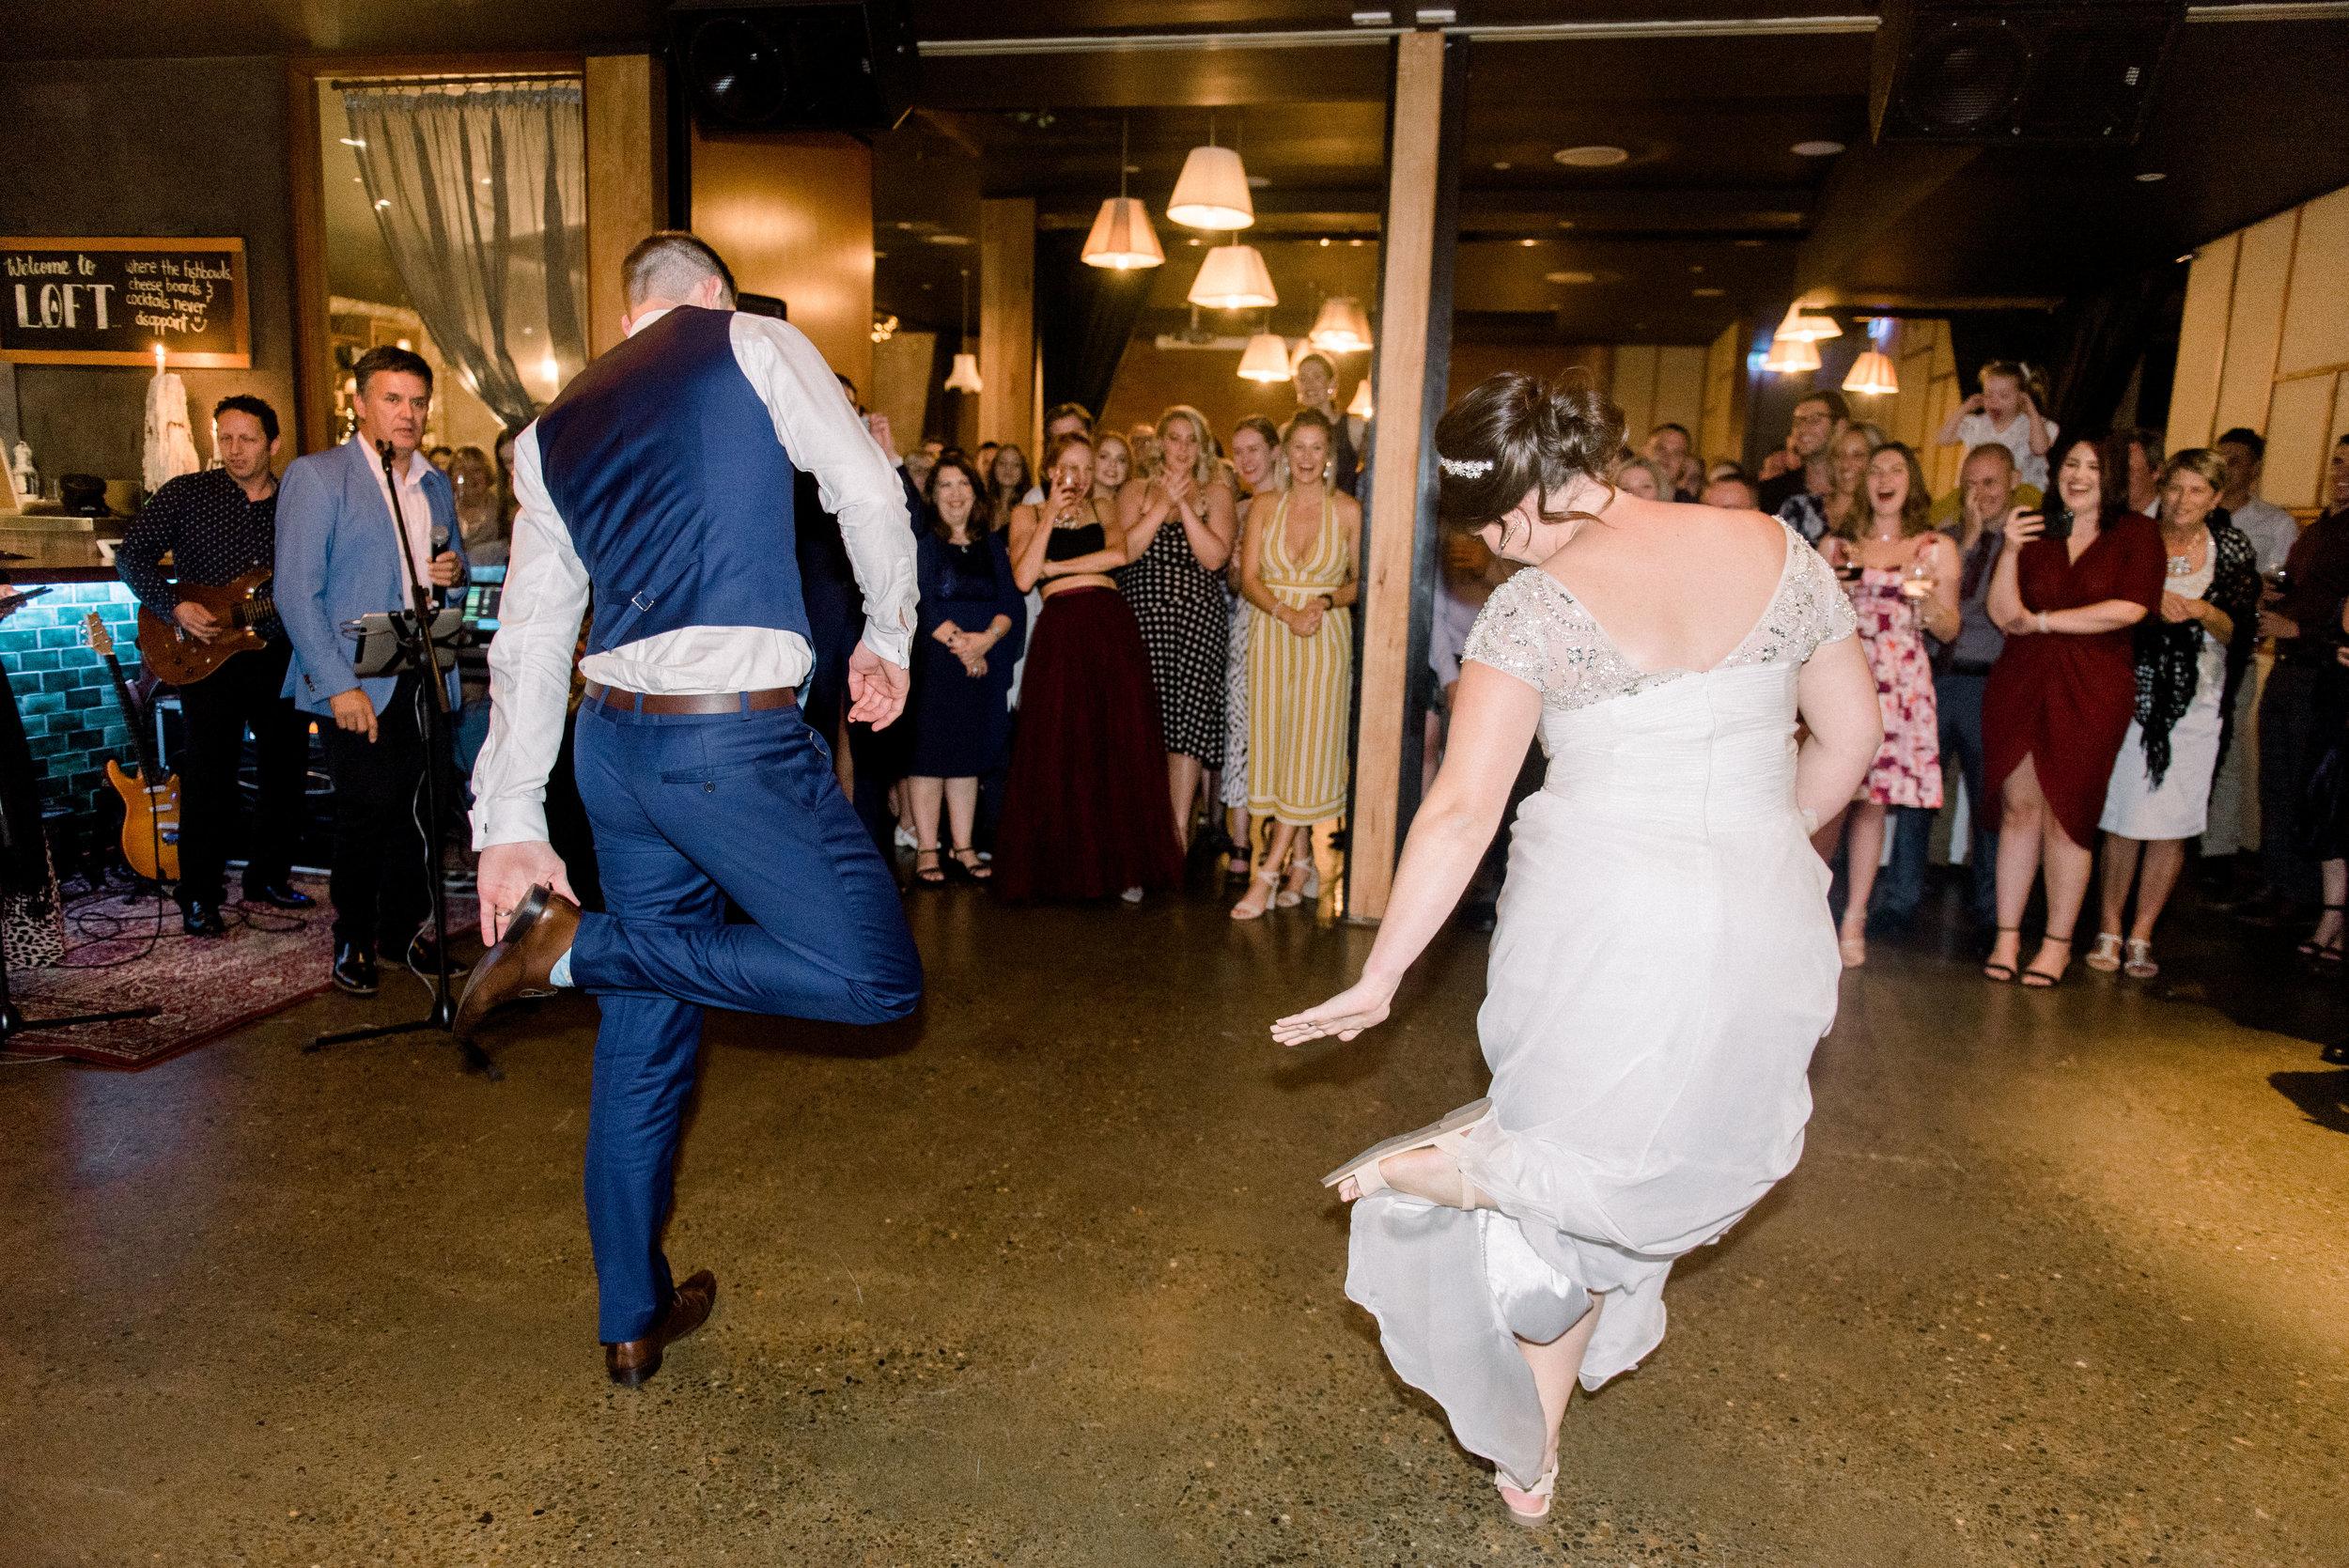 brisbane-city-wedding-photographer-loft-westend-20.jpg